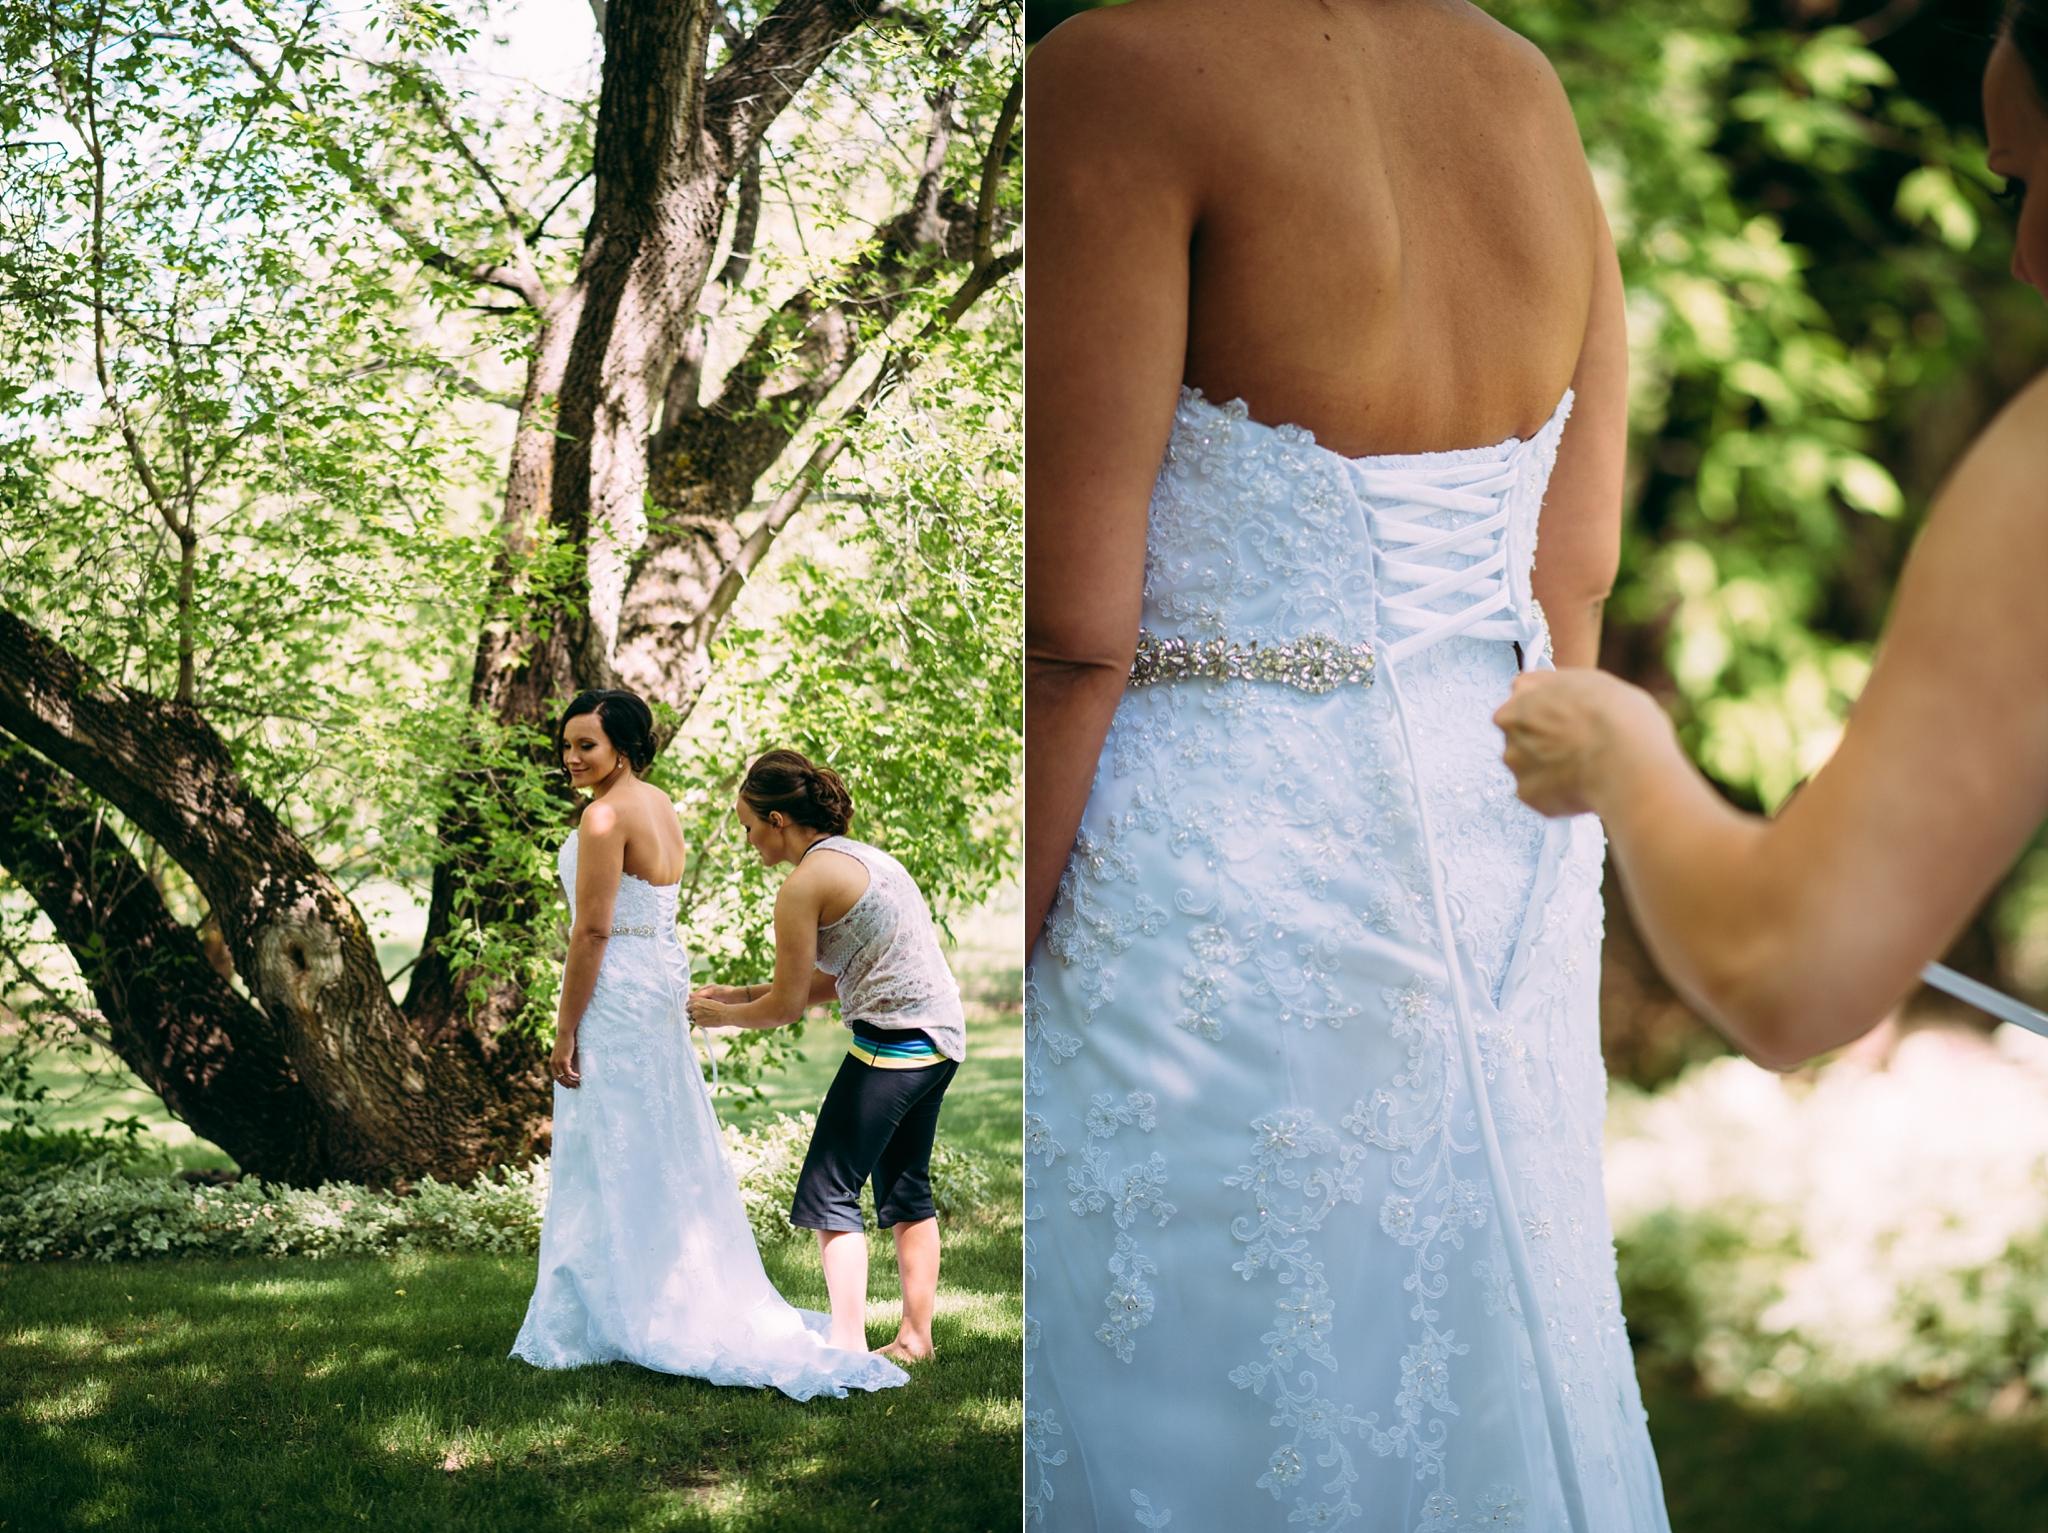 kaihla_tonai_intimate_wedding_elopement_photographer_1506